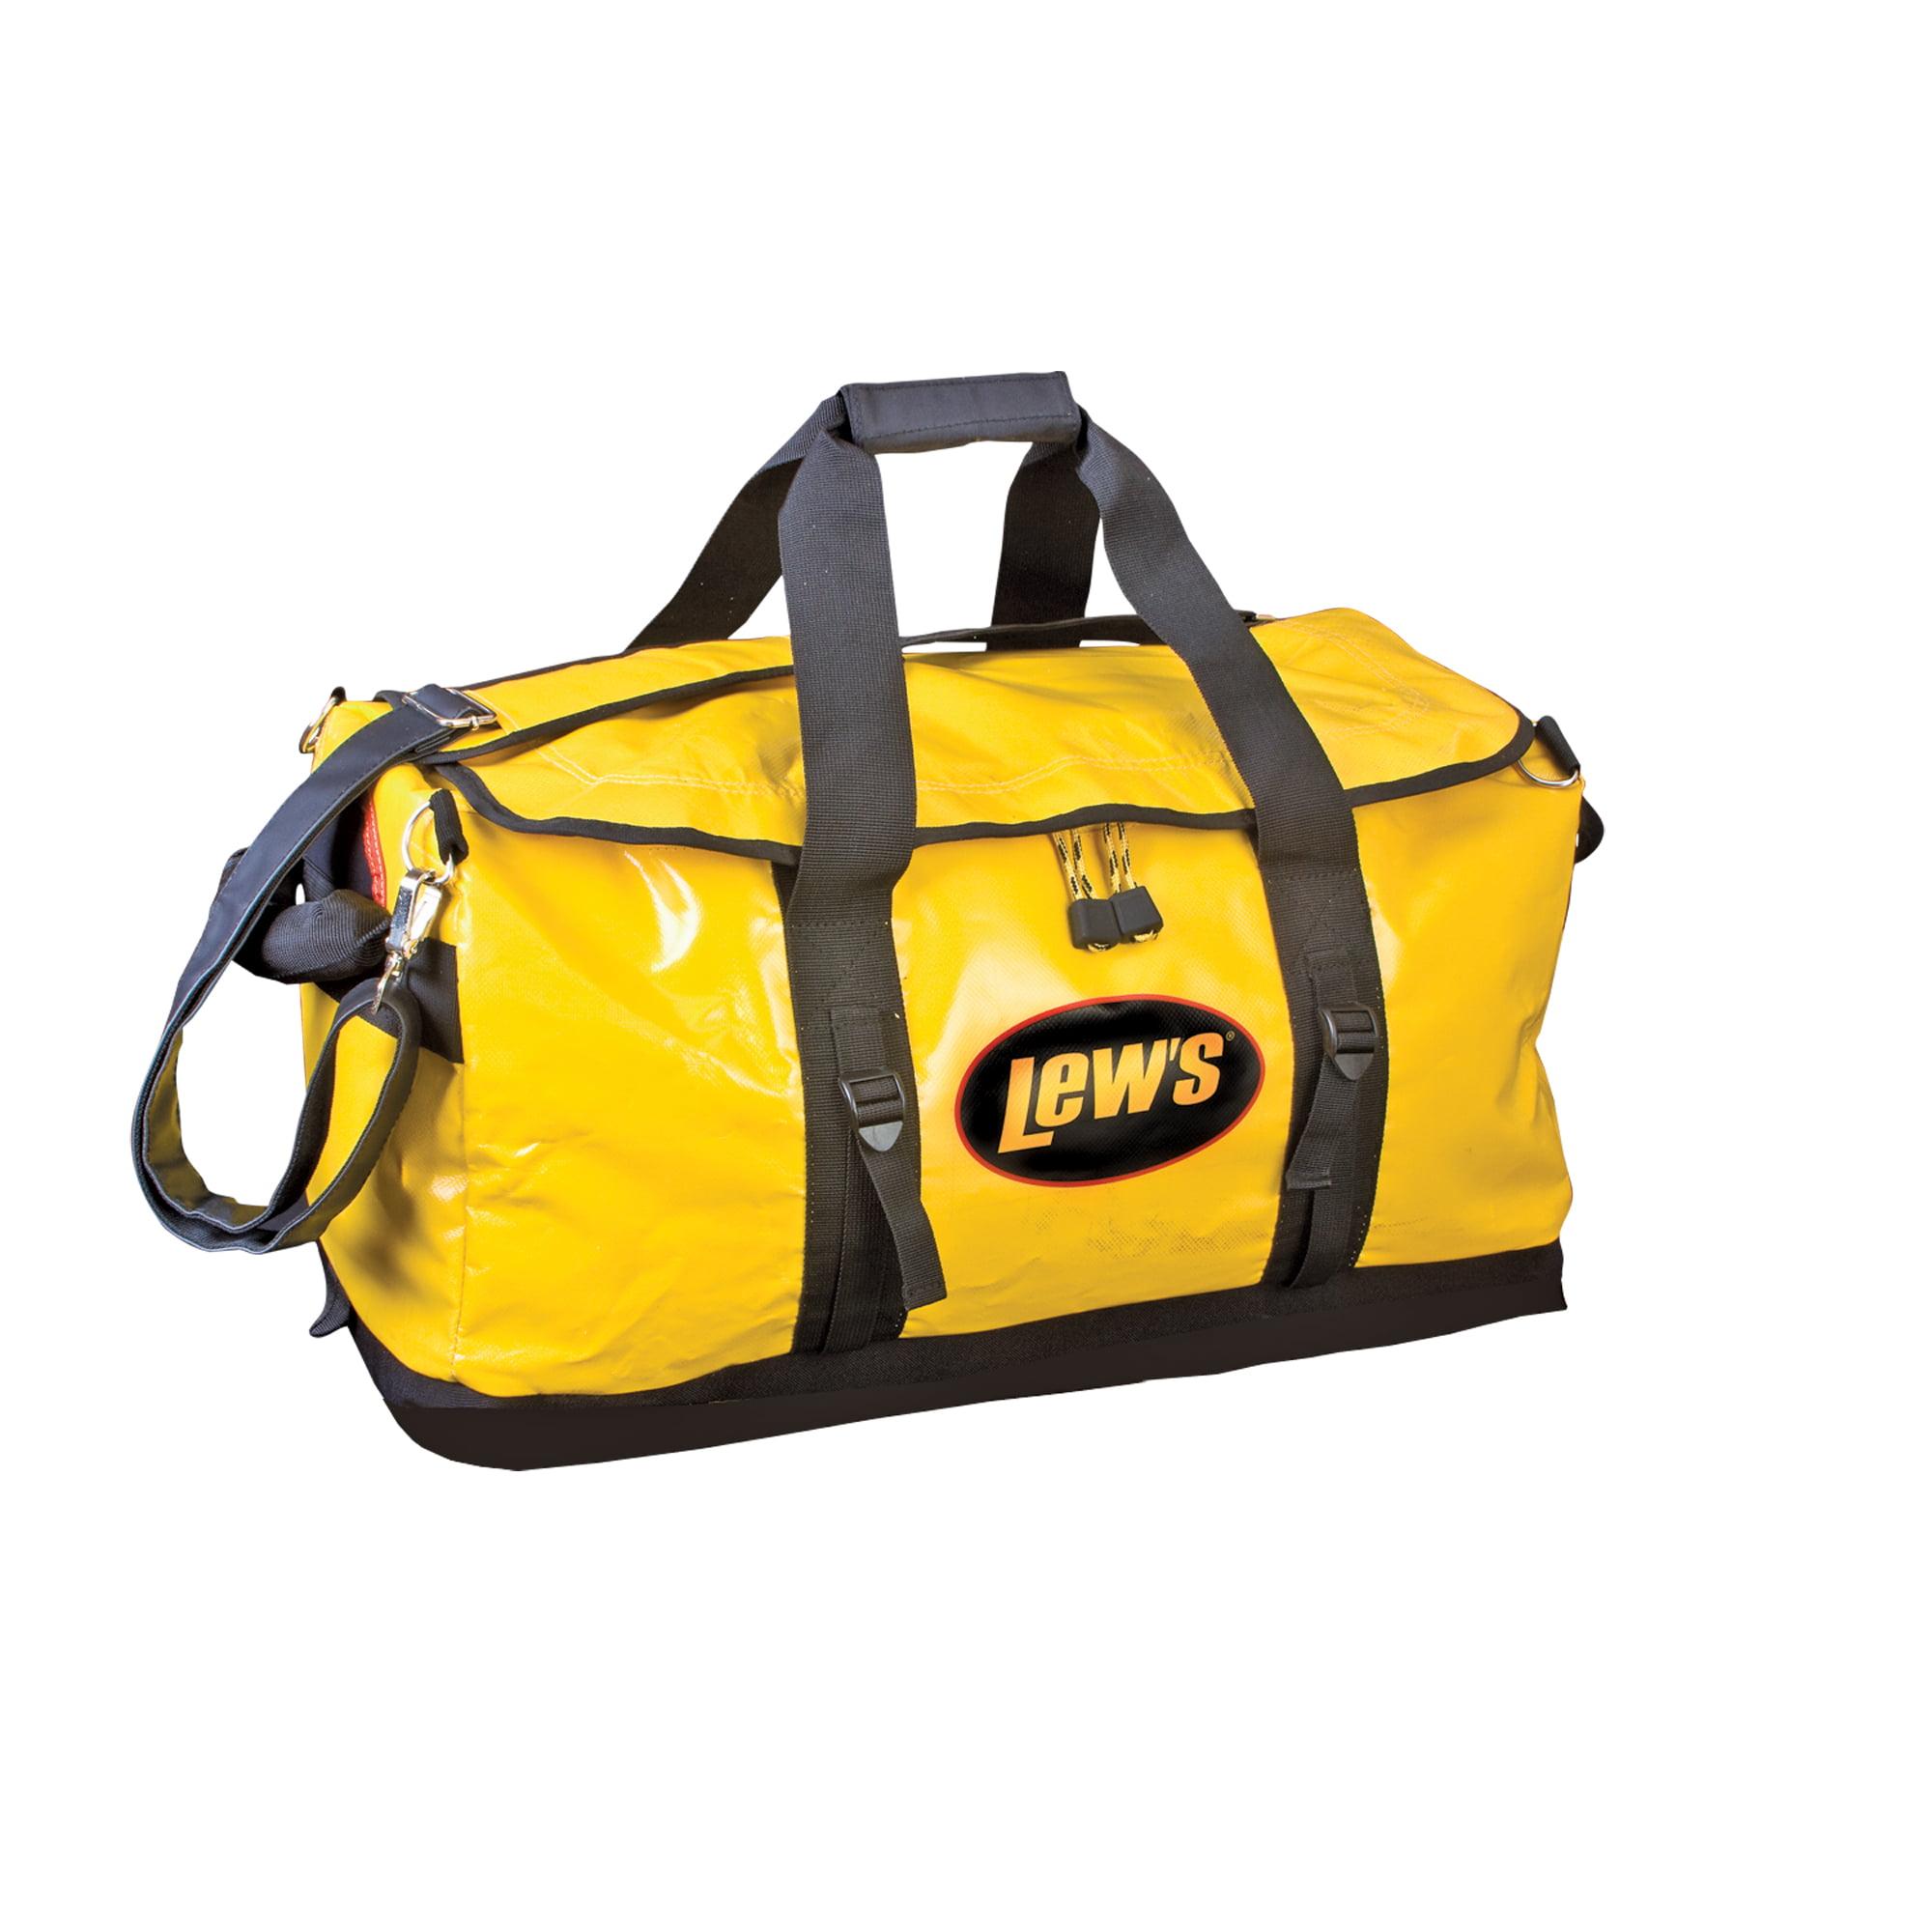 Lews Fishing Lew's Speed Boat Bag Yellow/Black, 24